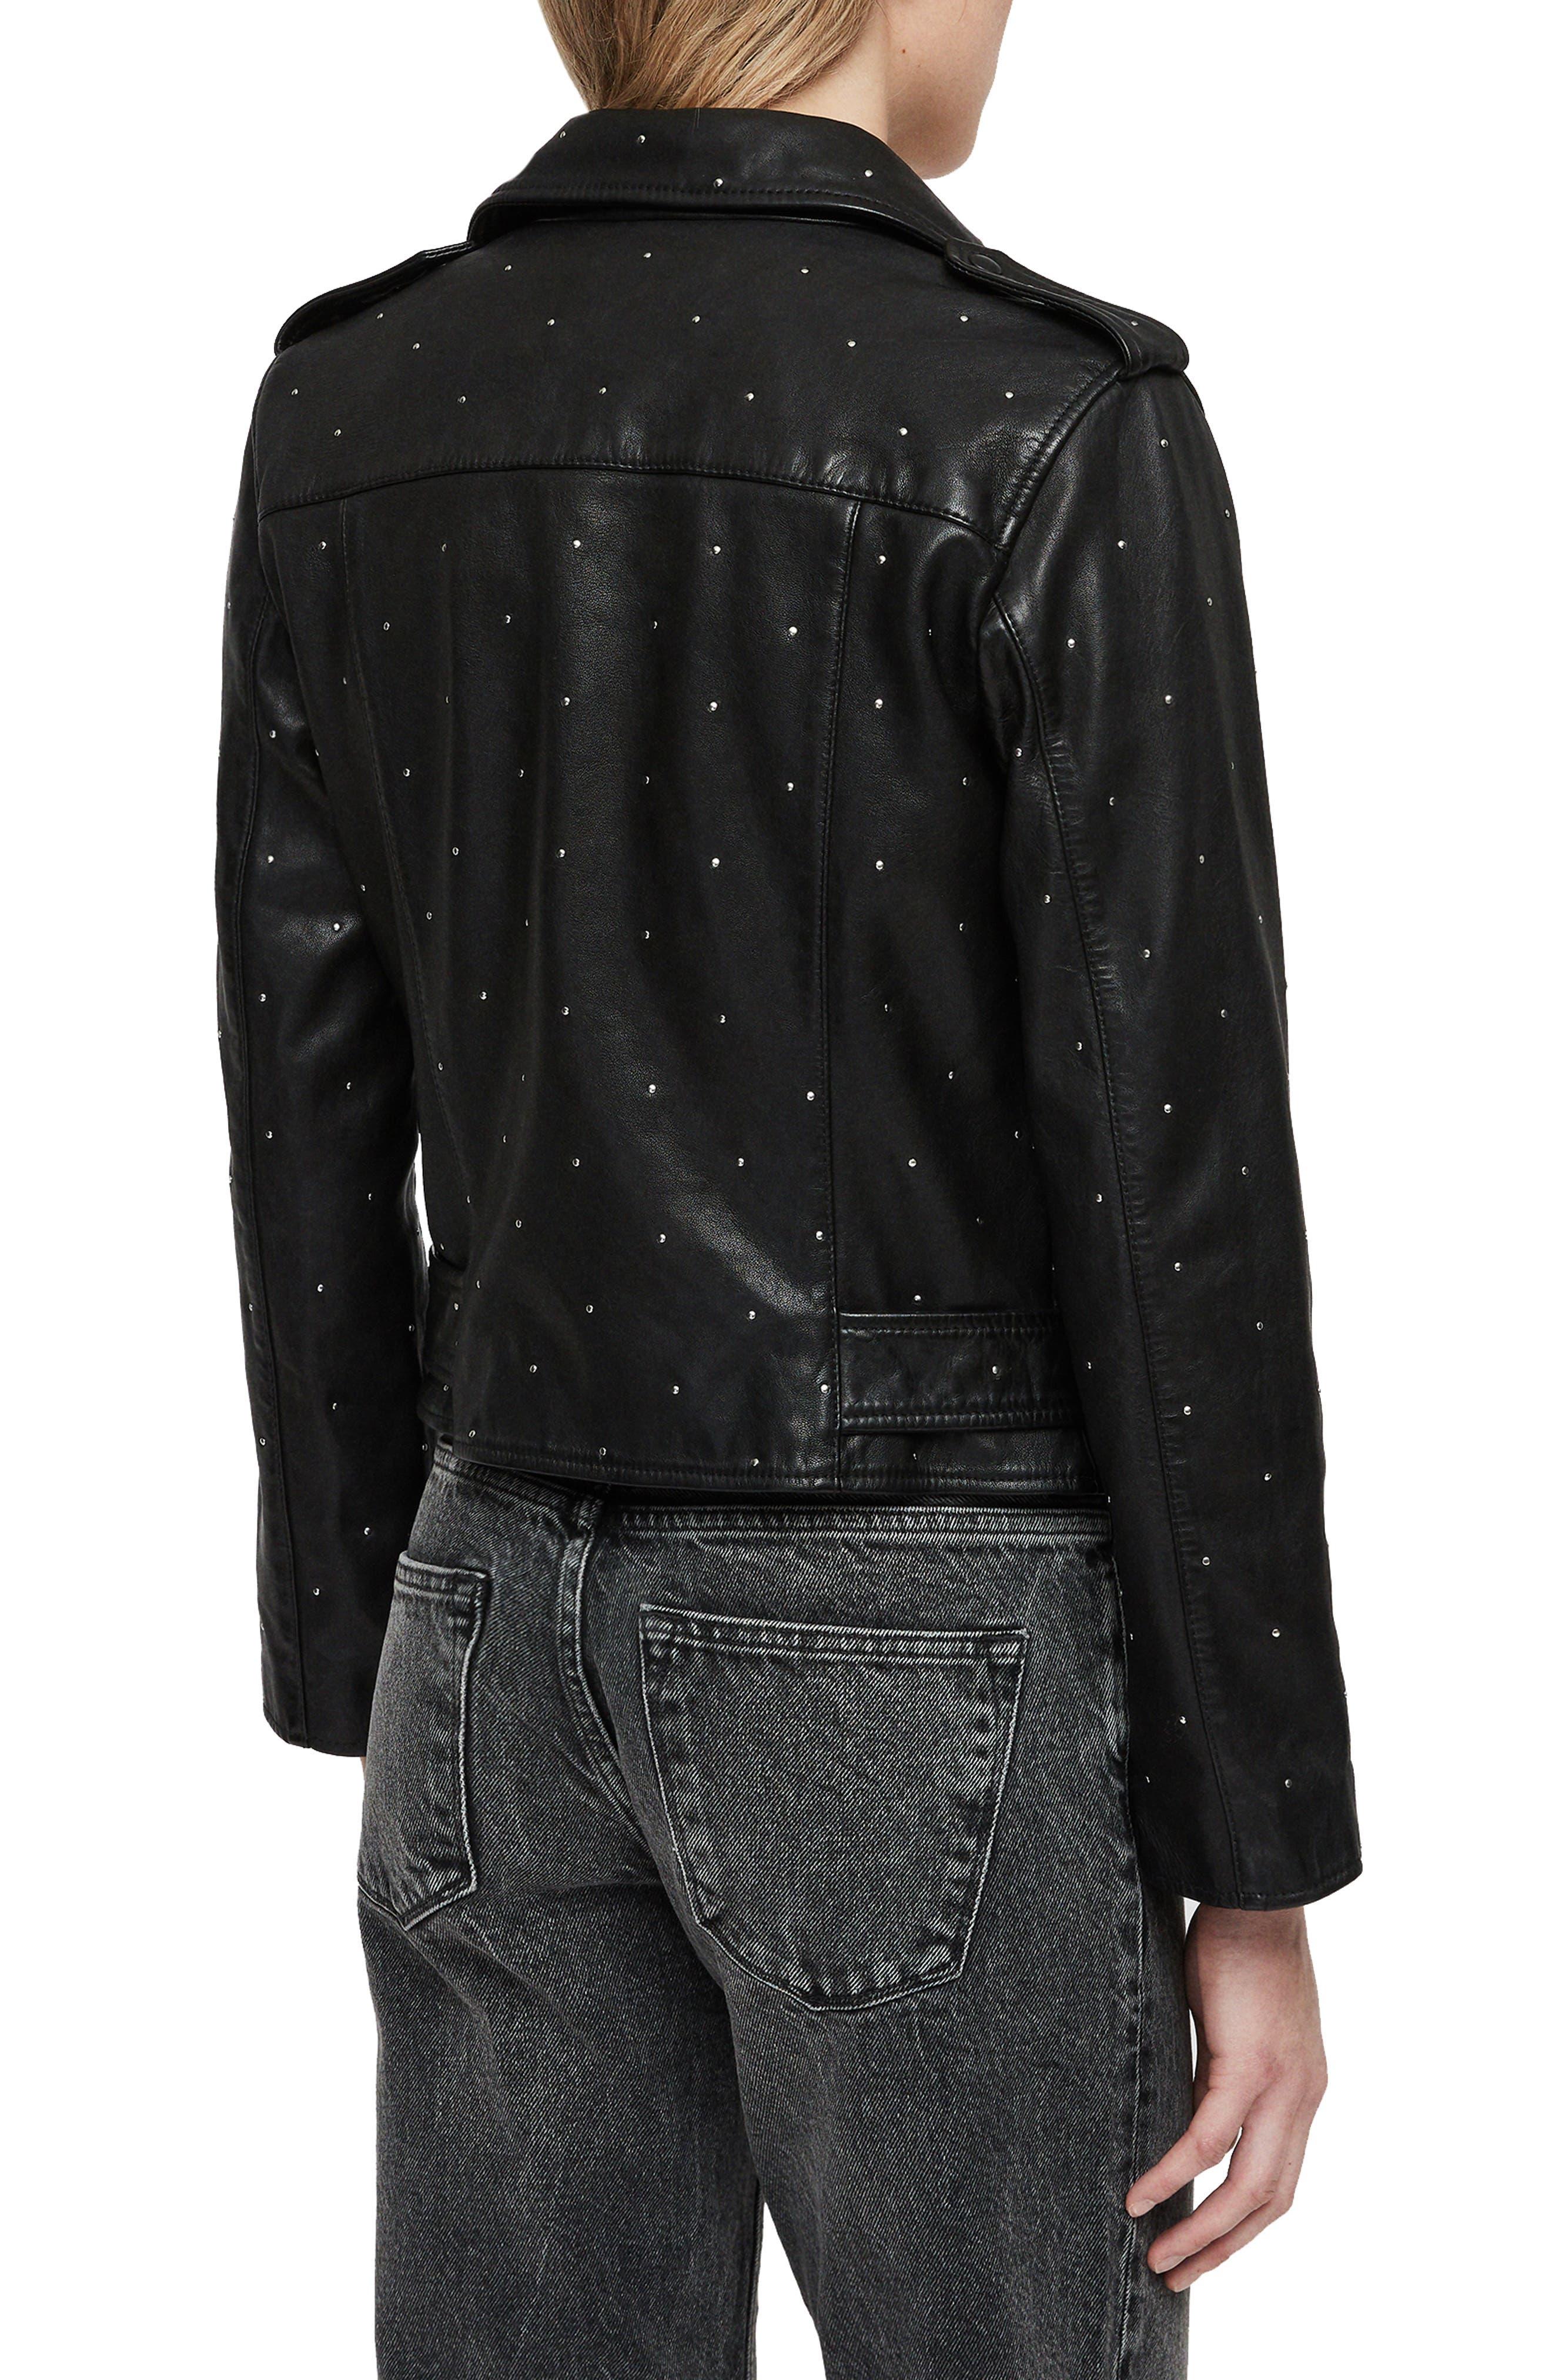 Balfern Studded Leather Biker Jacket,                             Alternate thumbnail 2, color,                             001